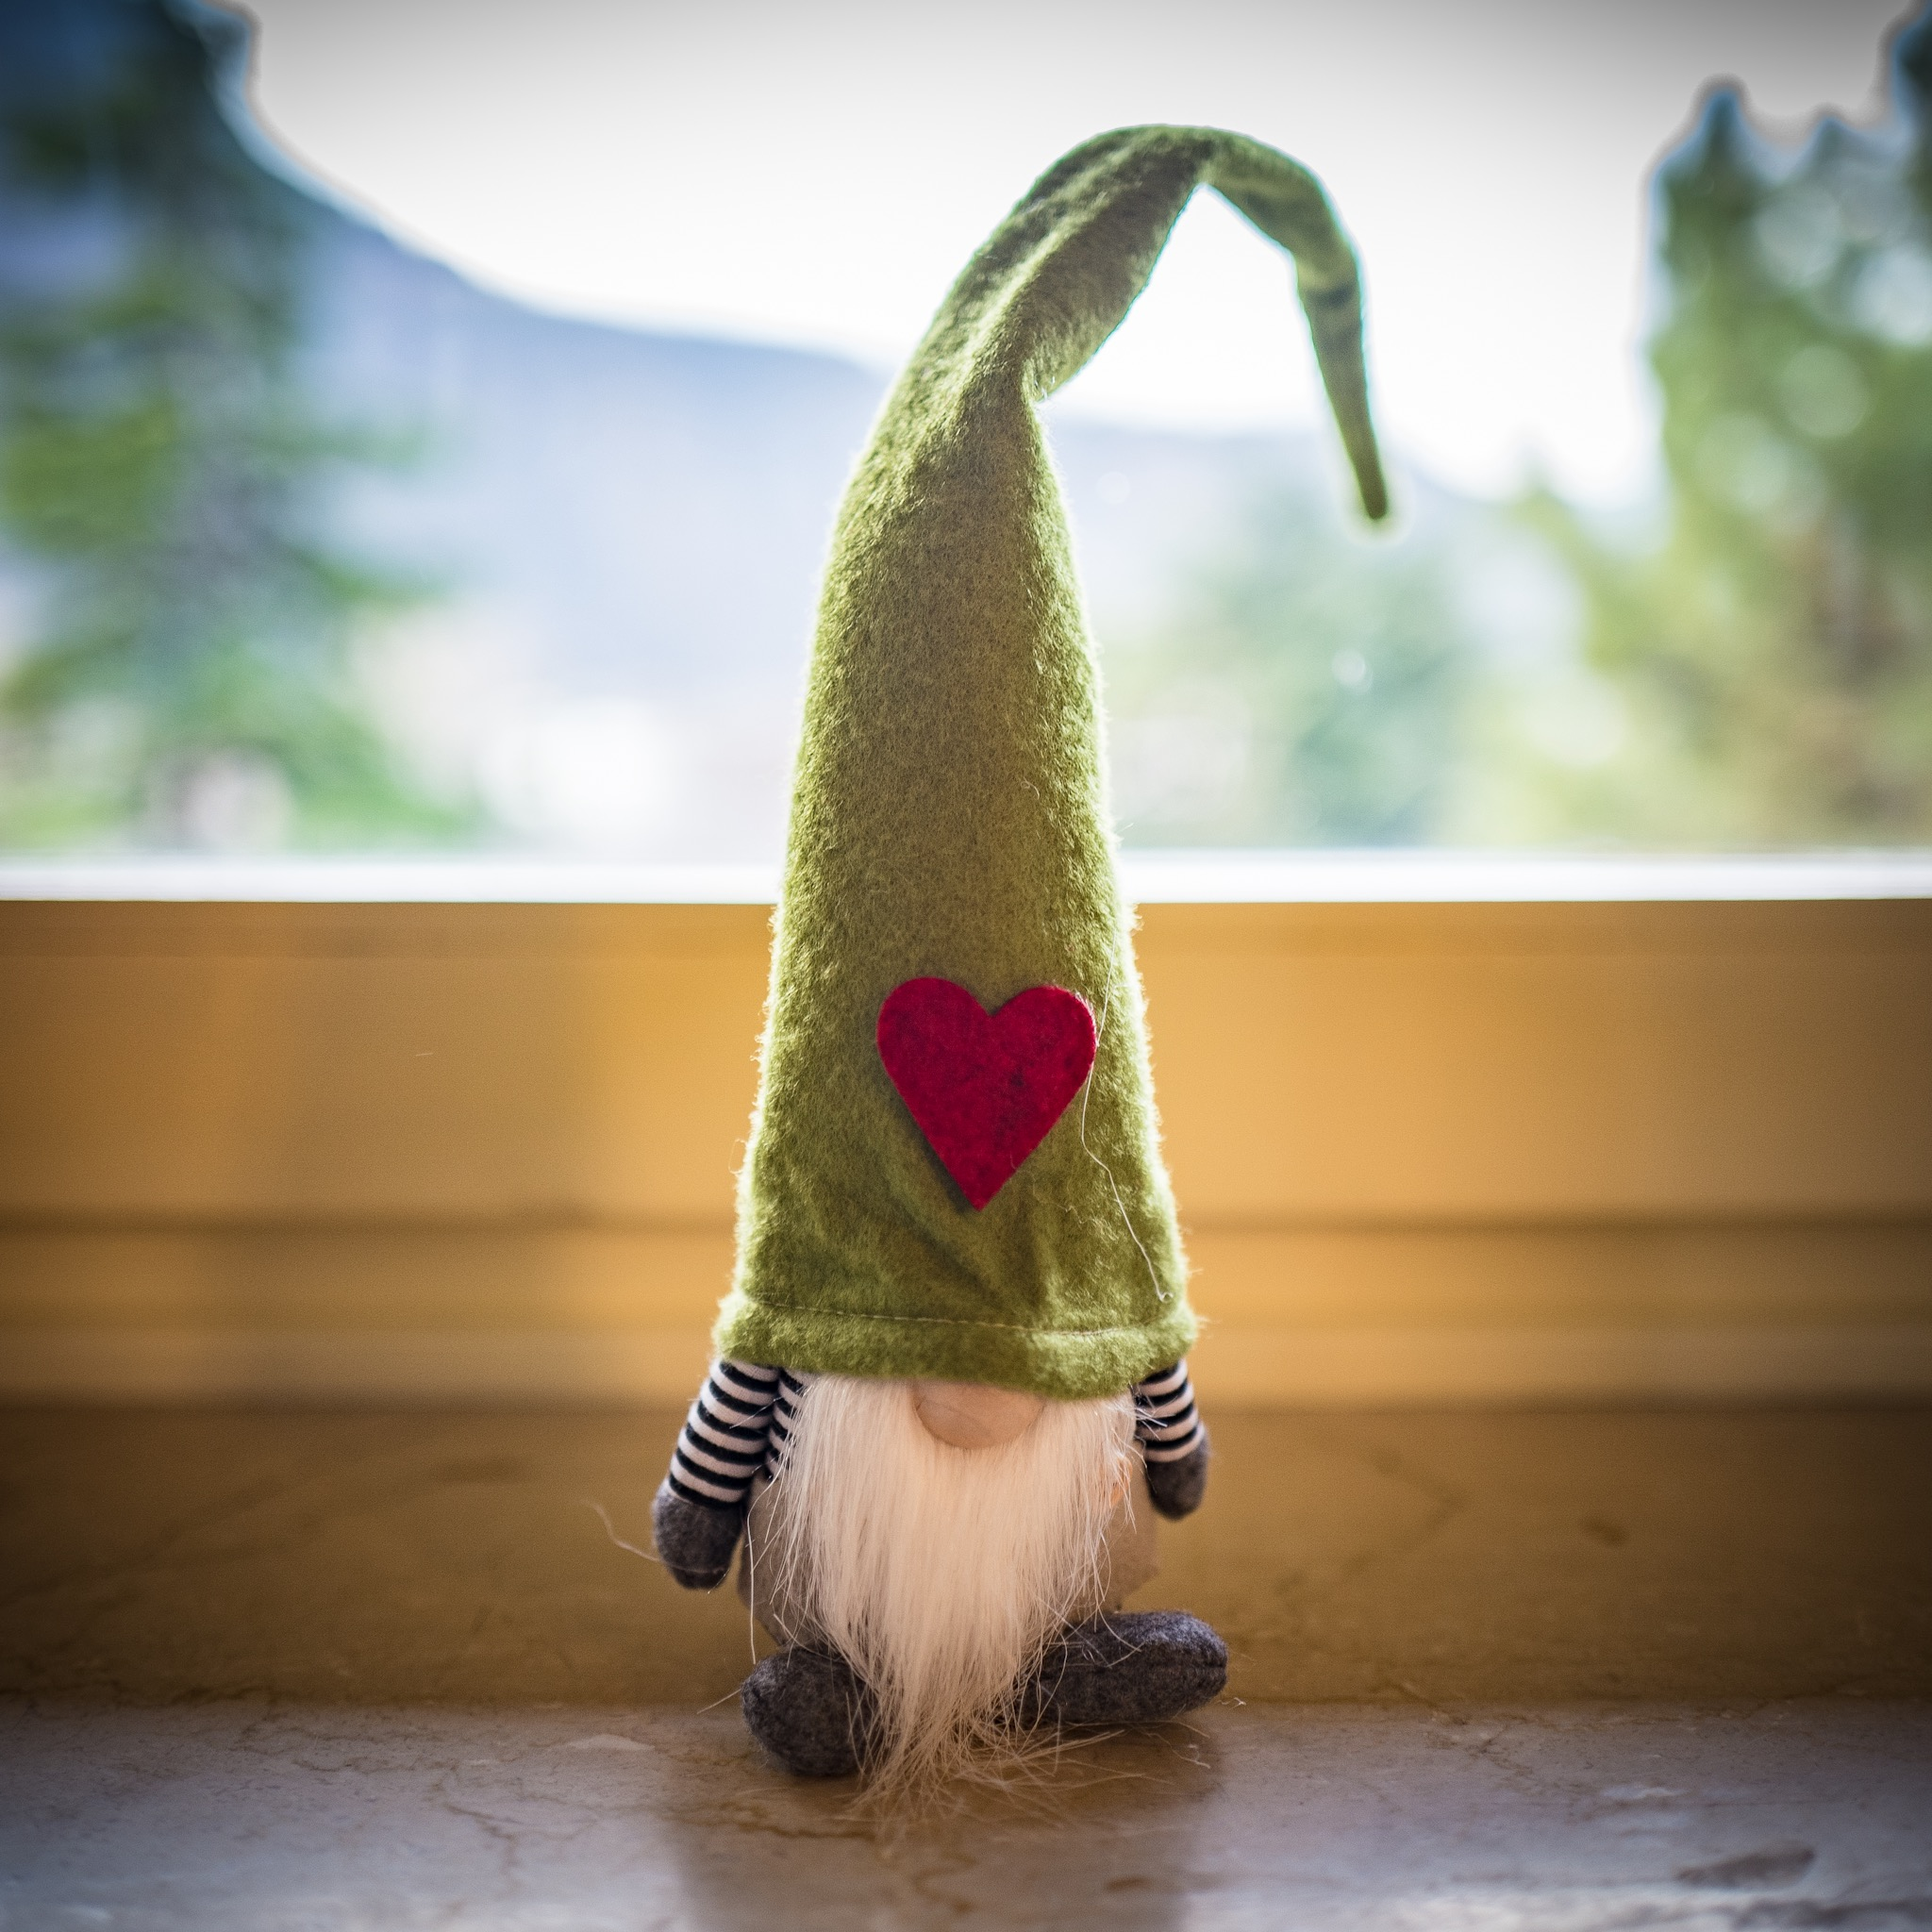 Meet our new family mascot…Gnomeo!